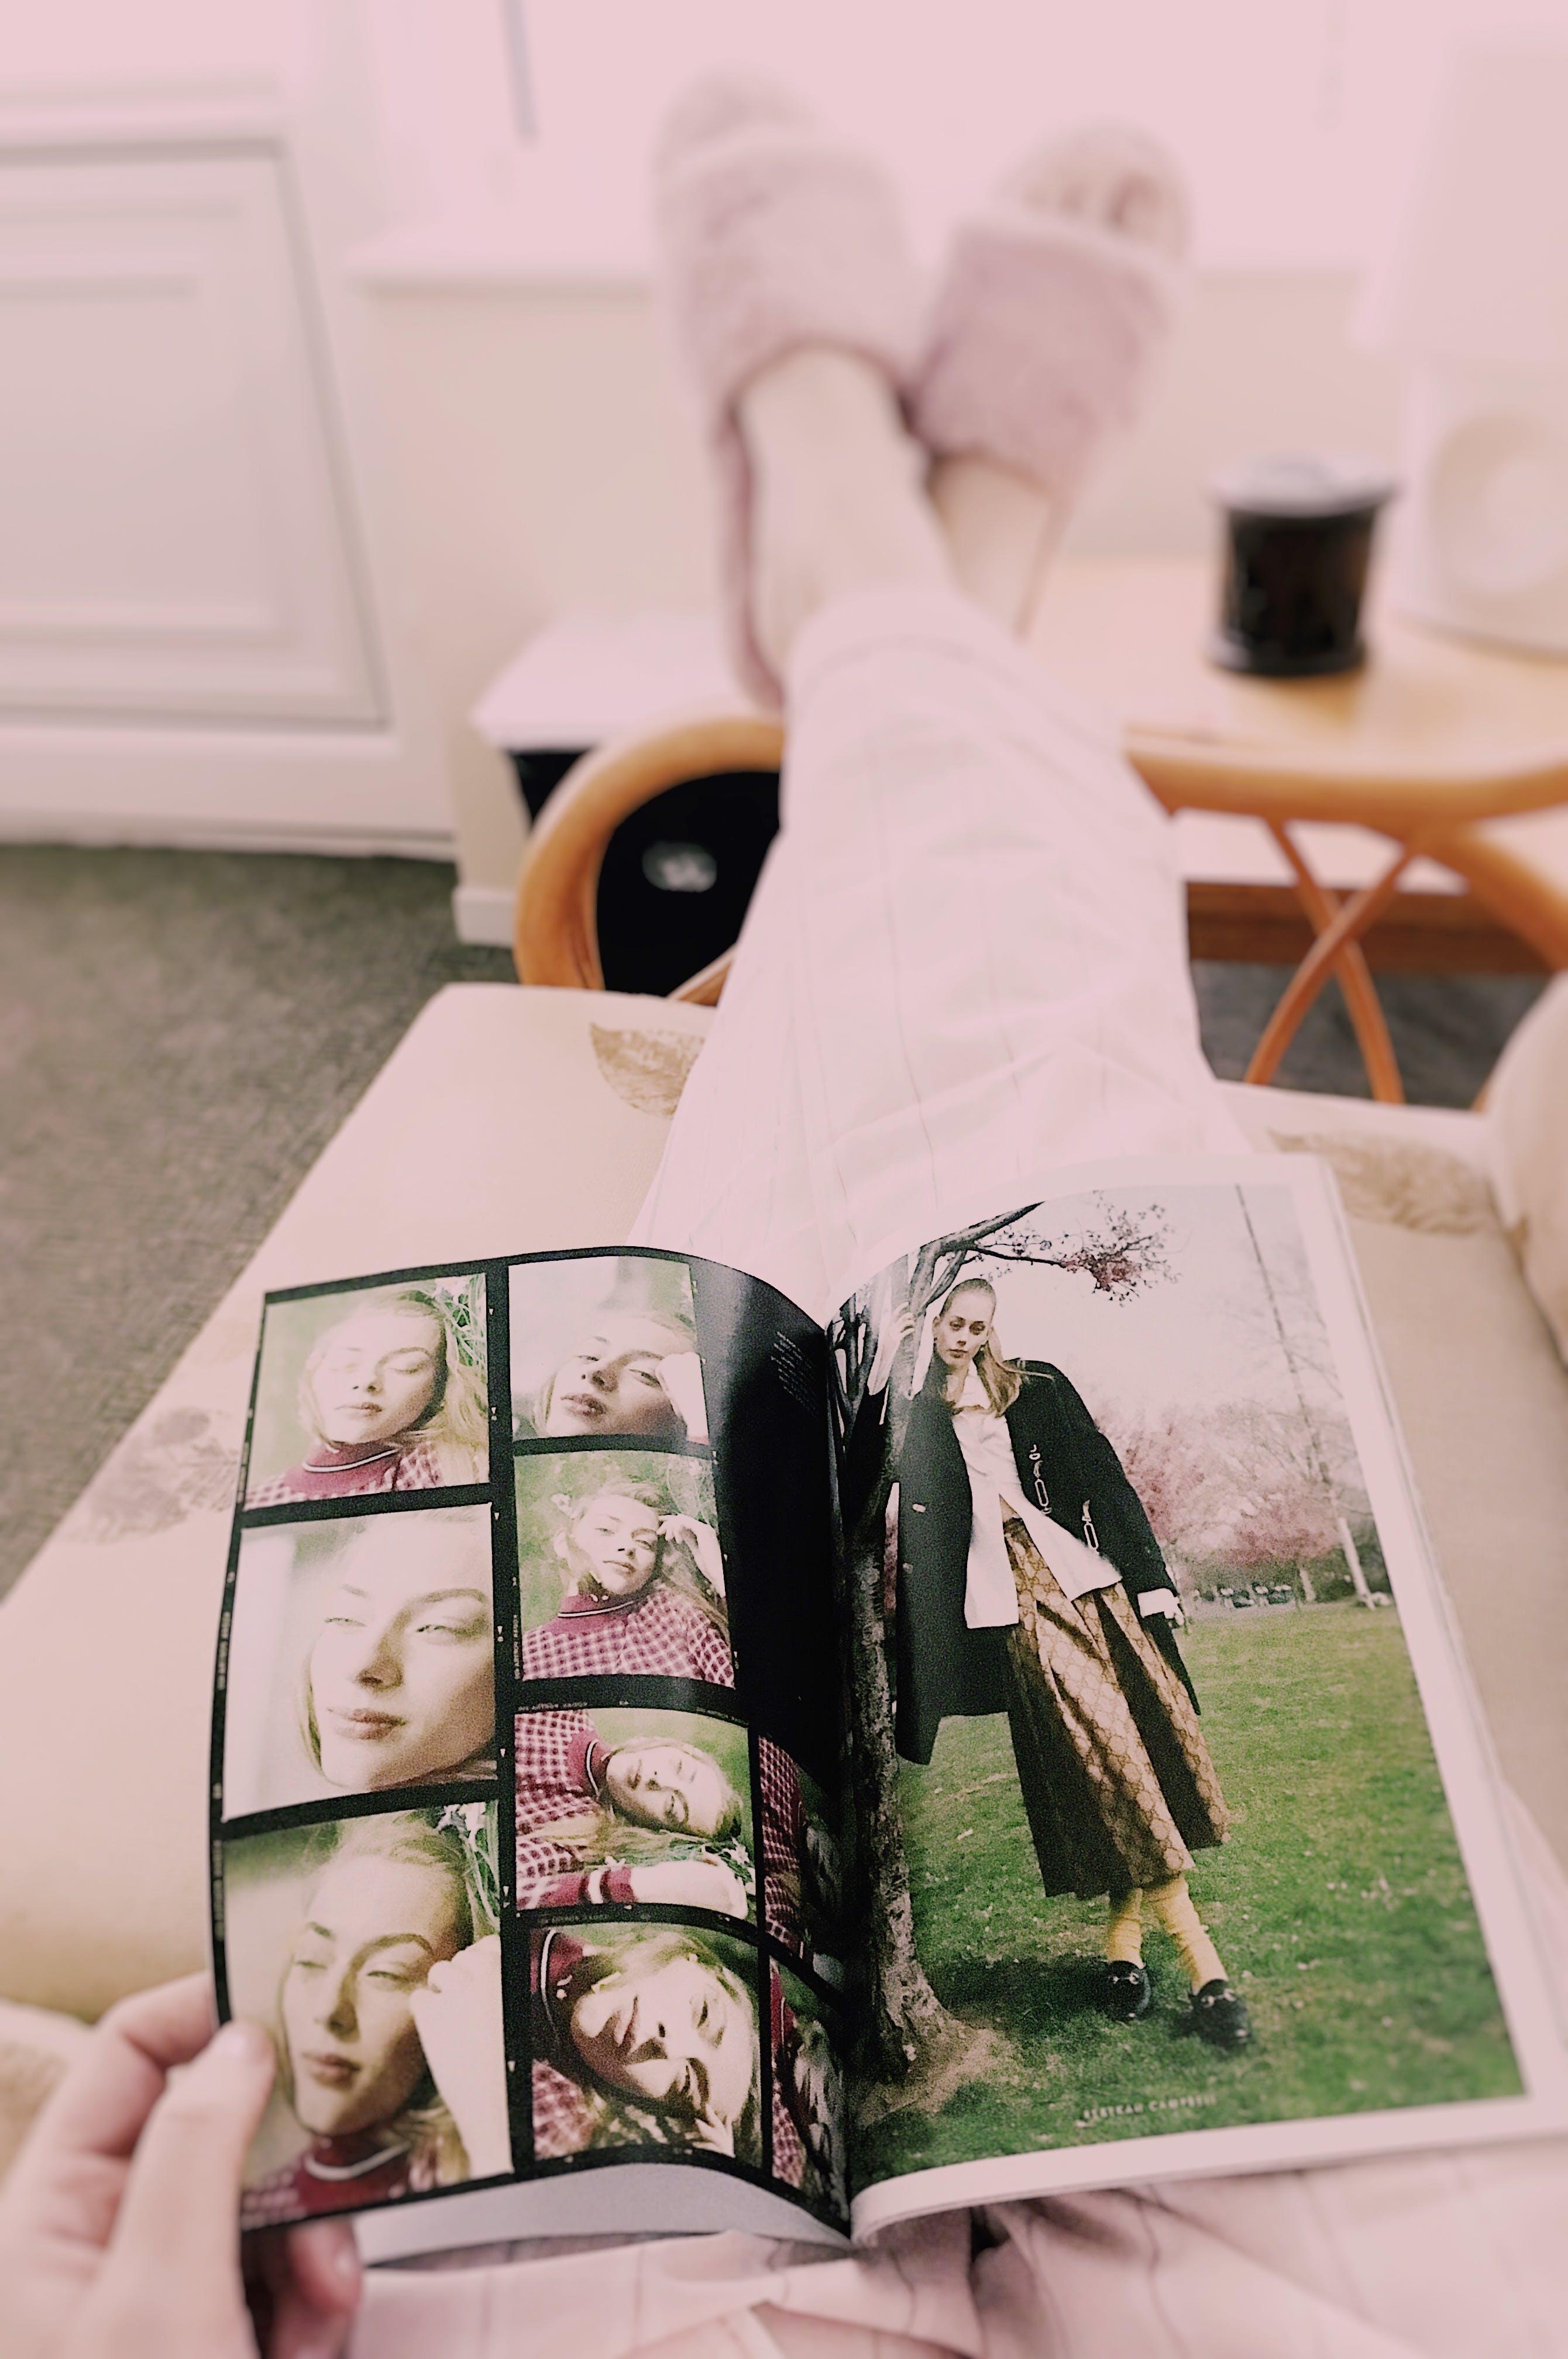 Kostenloses Stock Foto zu fashion, person, frau, entspannung